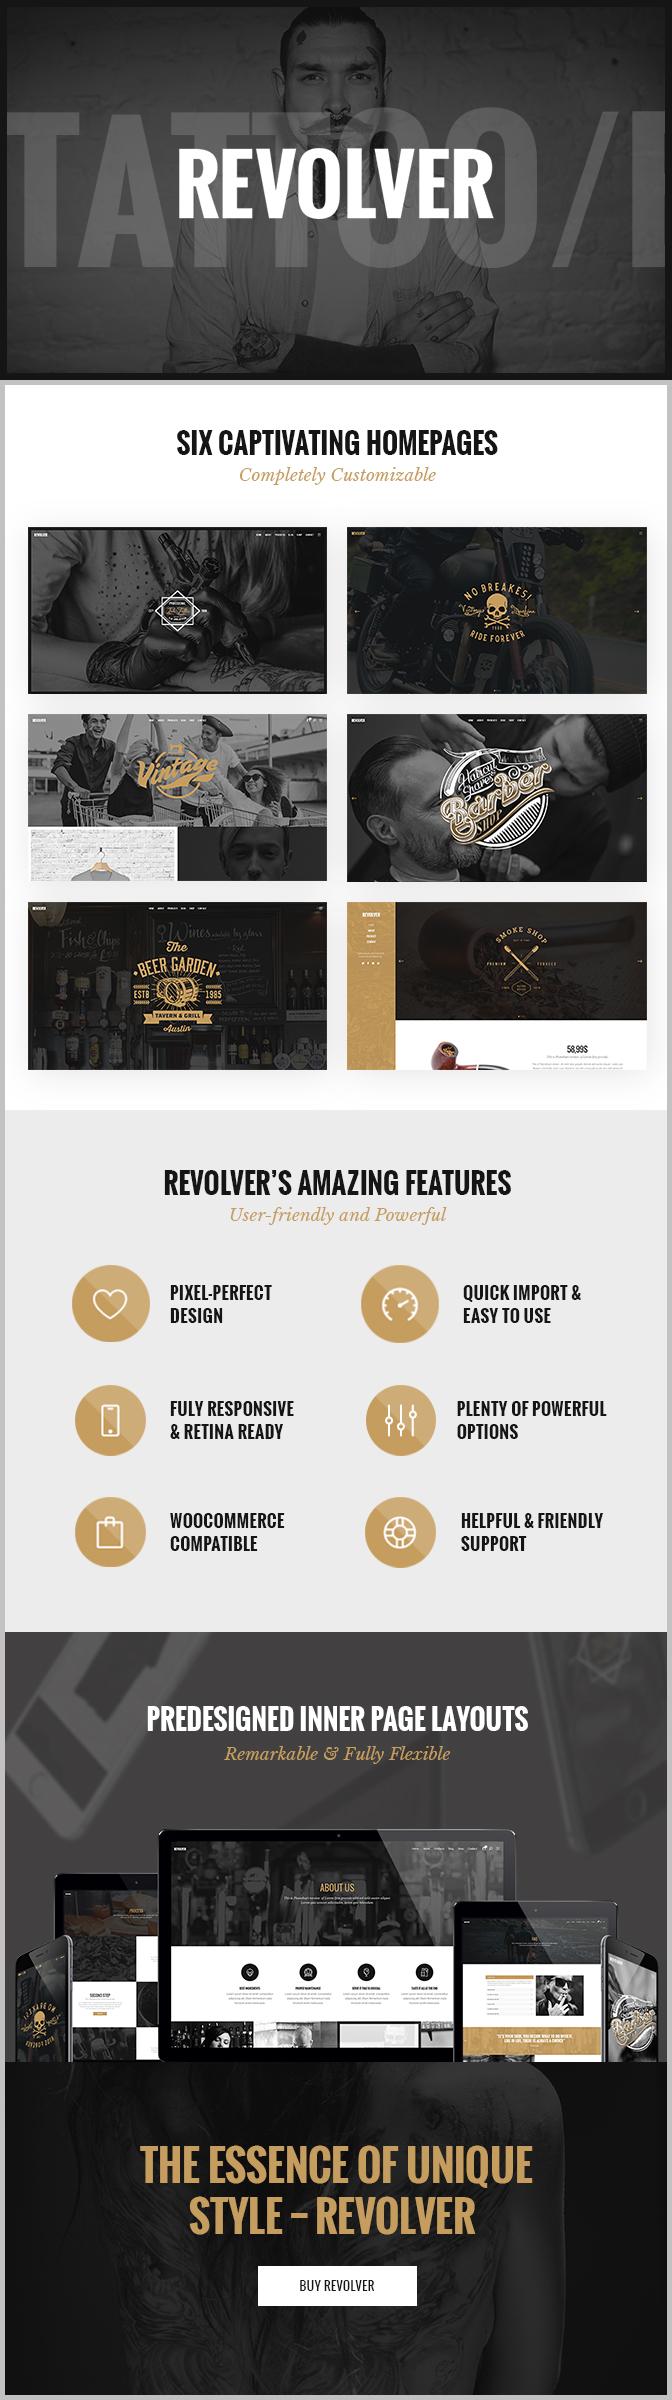 Revolver - Tattoo Studio and Barbershop Theme - 1